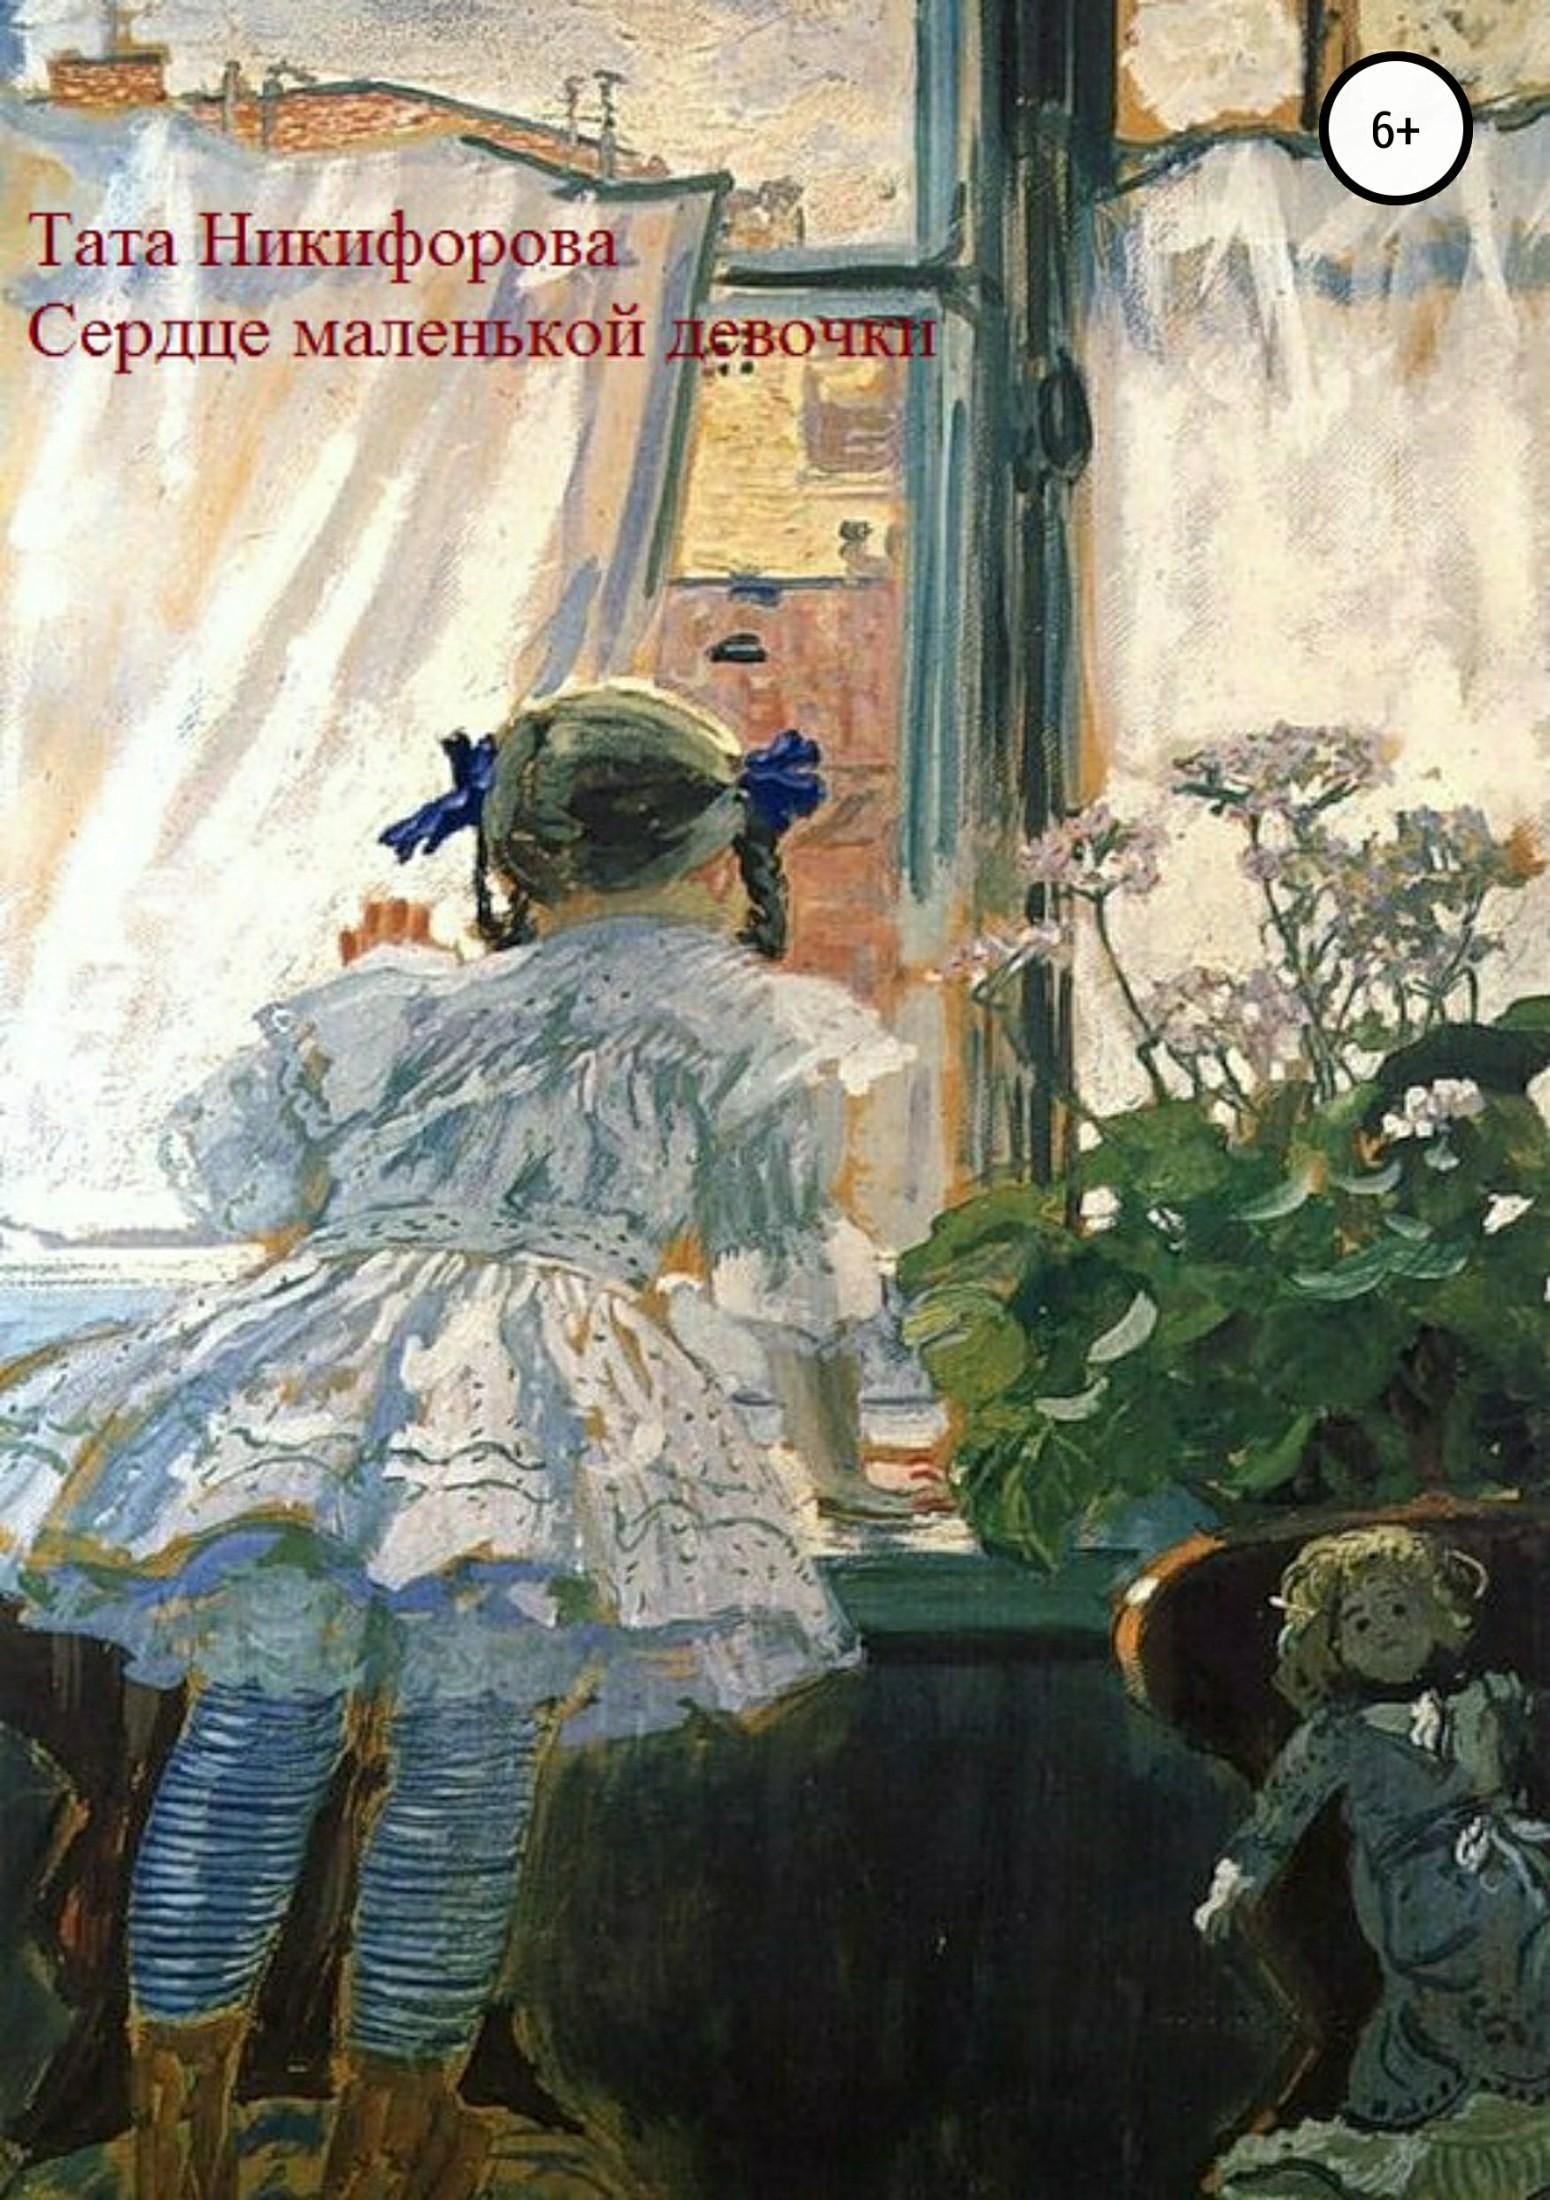 Тата Никифорова - Сердце маленькой девочки